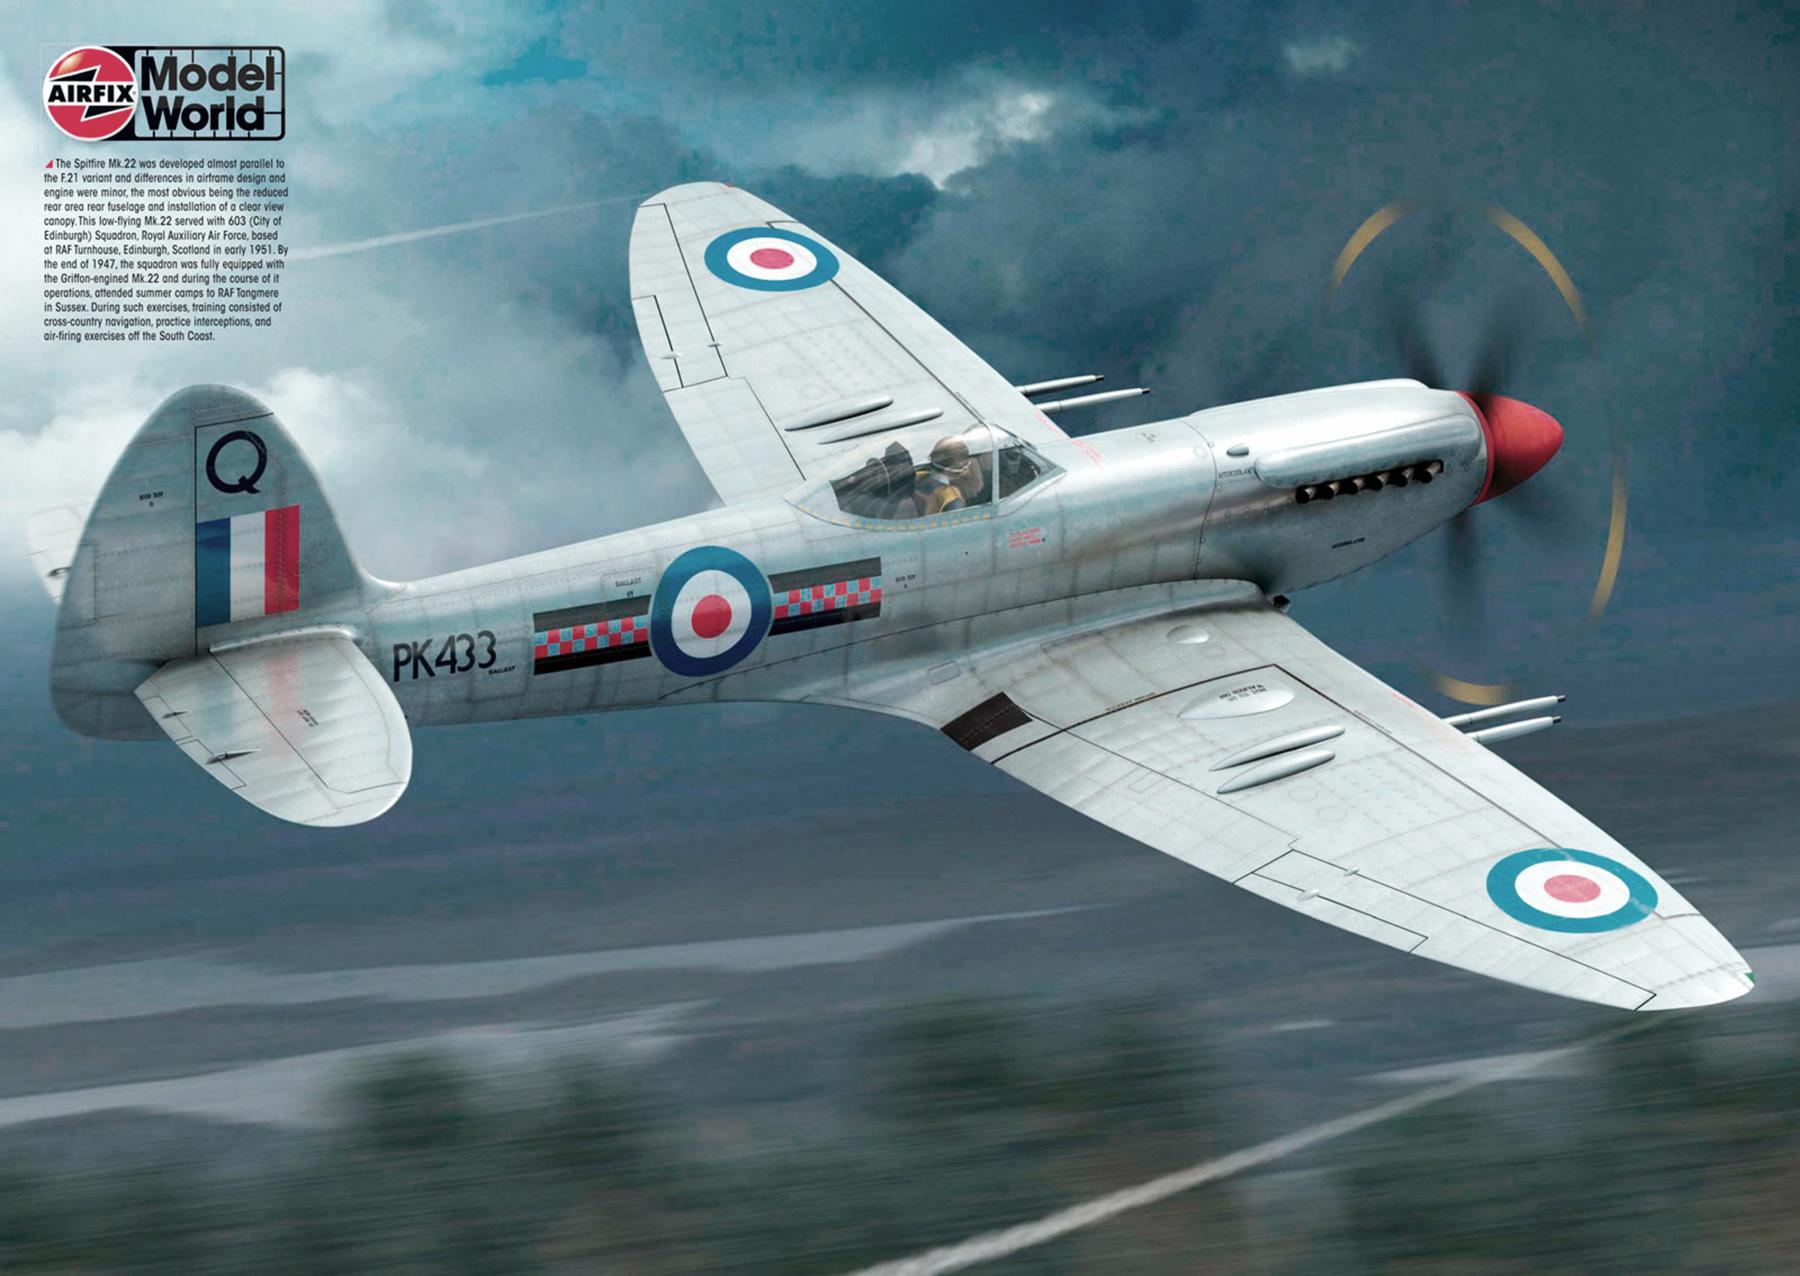 Spitfire Mk22 RAuxAF 603Sqn RAF Q PK433 Turnhouse Edinburgh Scotland 1951 by Airfix 0A